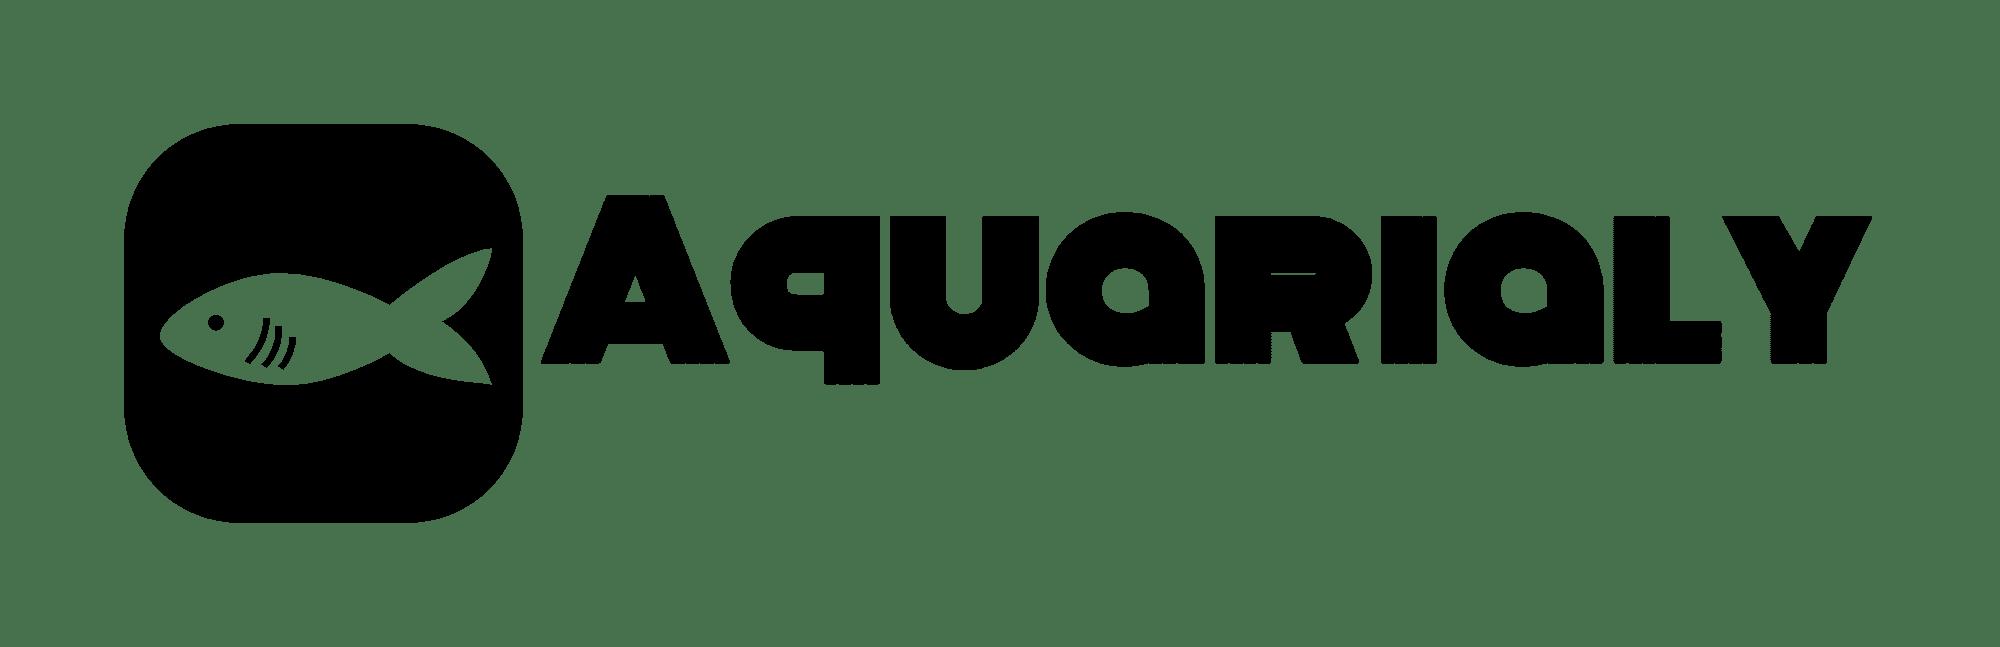 Aquarialy-logo